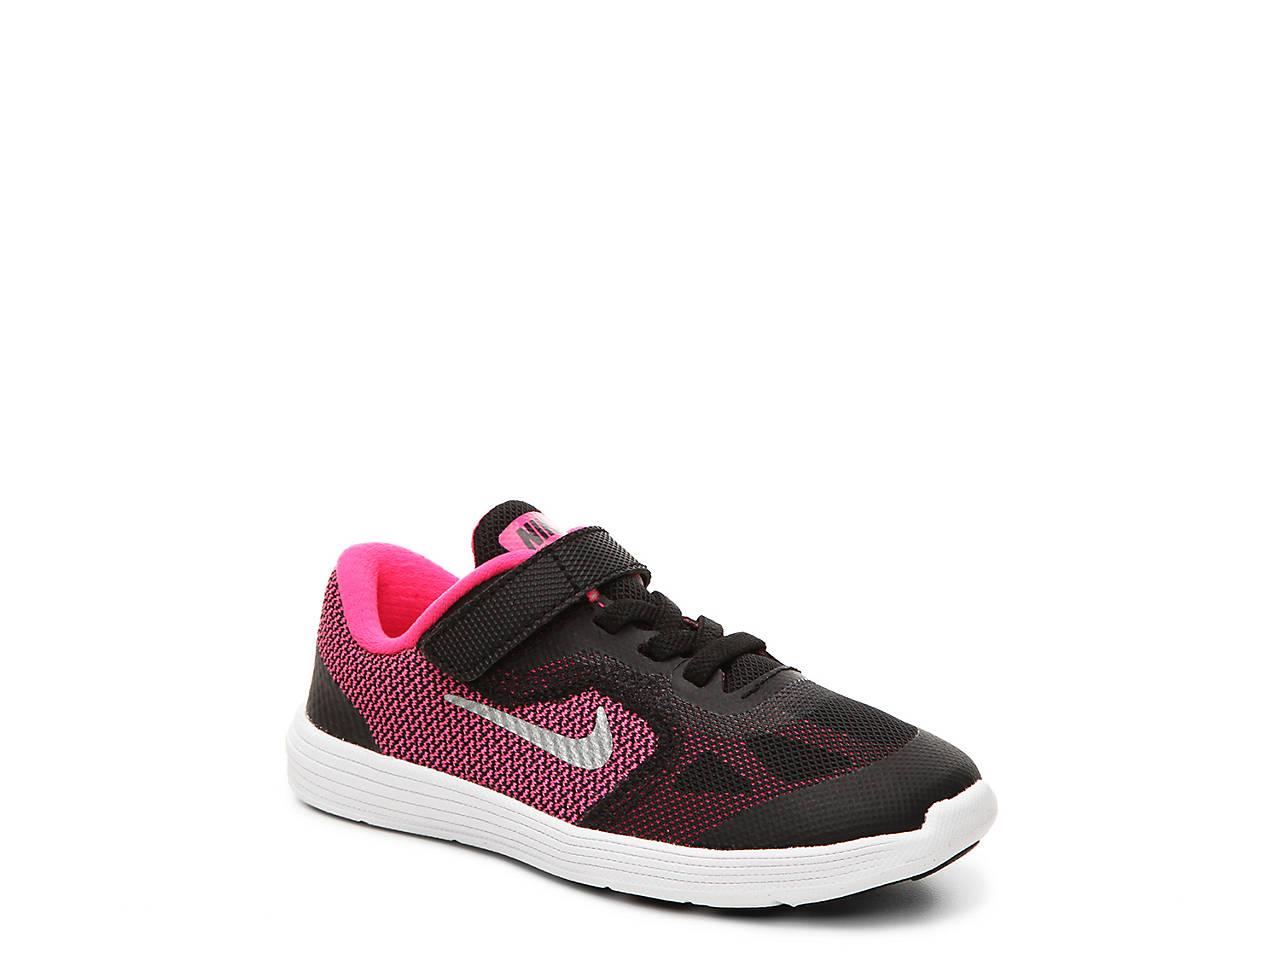 4141cae0e3f Nike Revolution 3 Infant   Toddler Running Shoe Kids Shoes